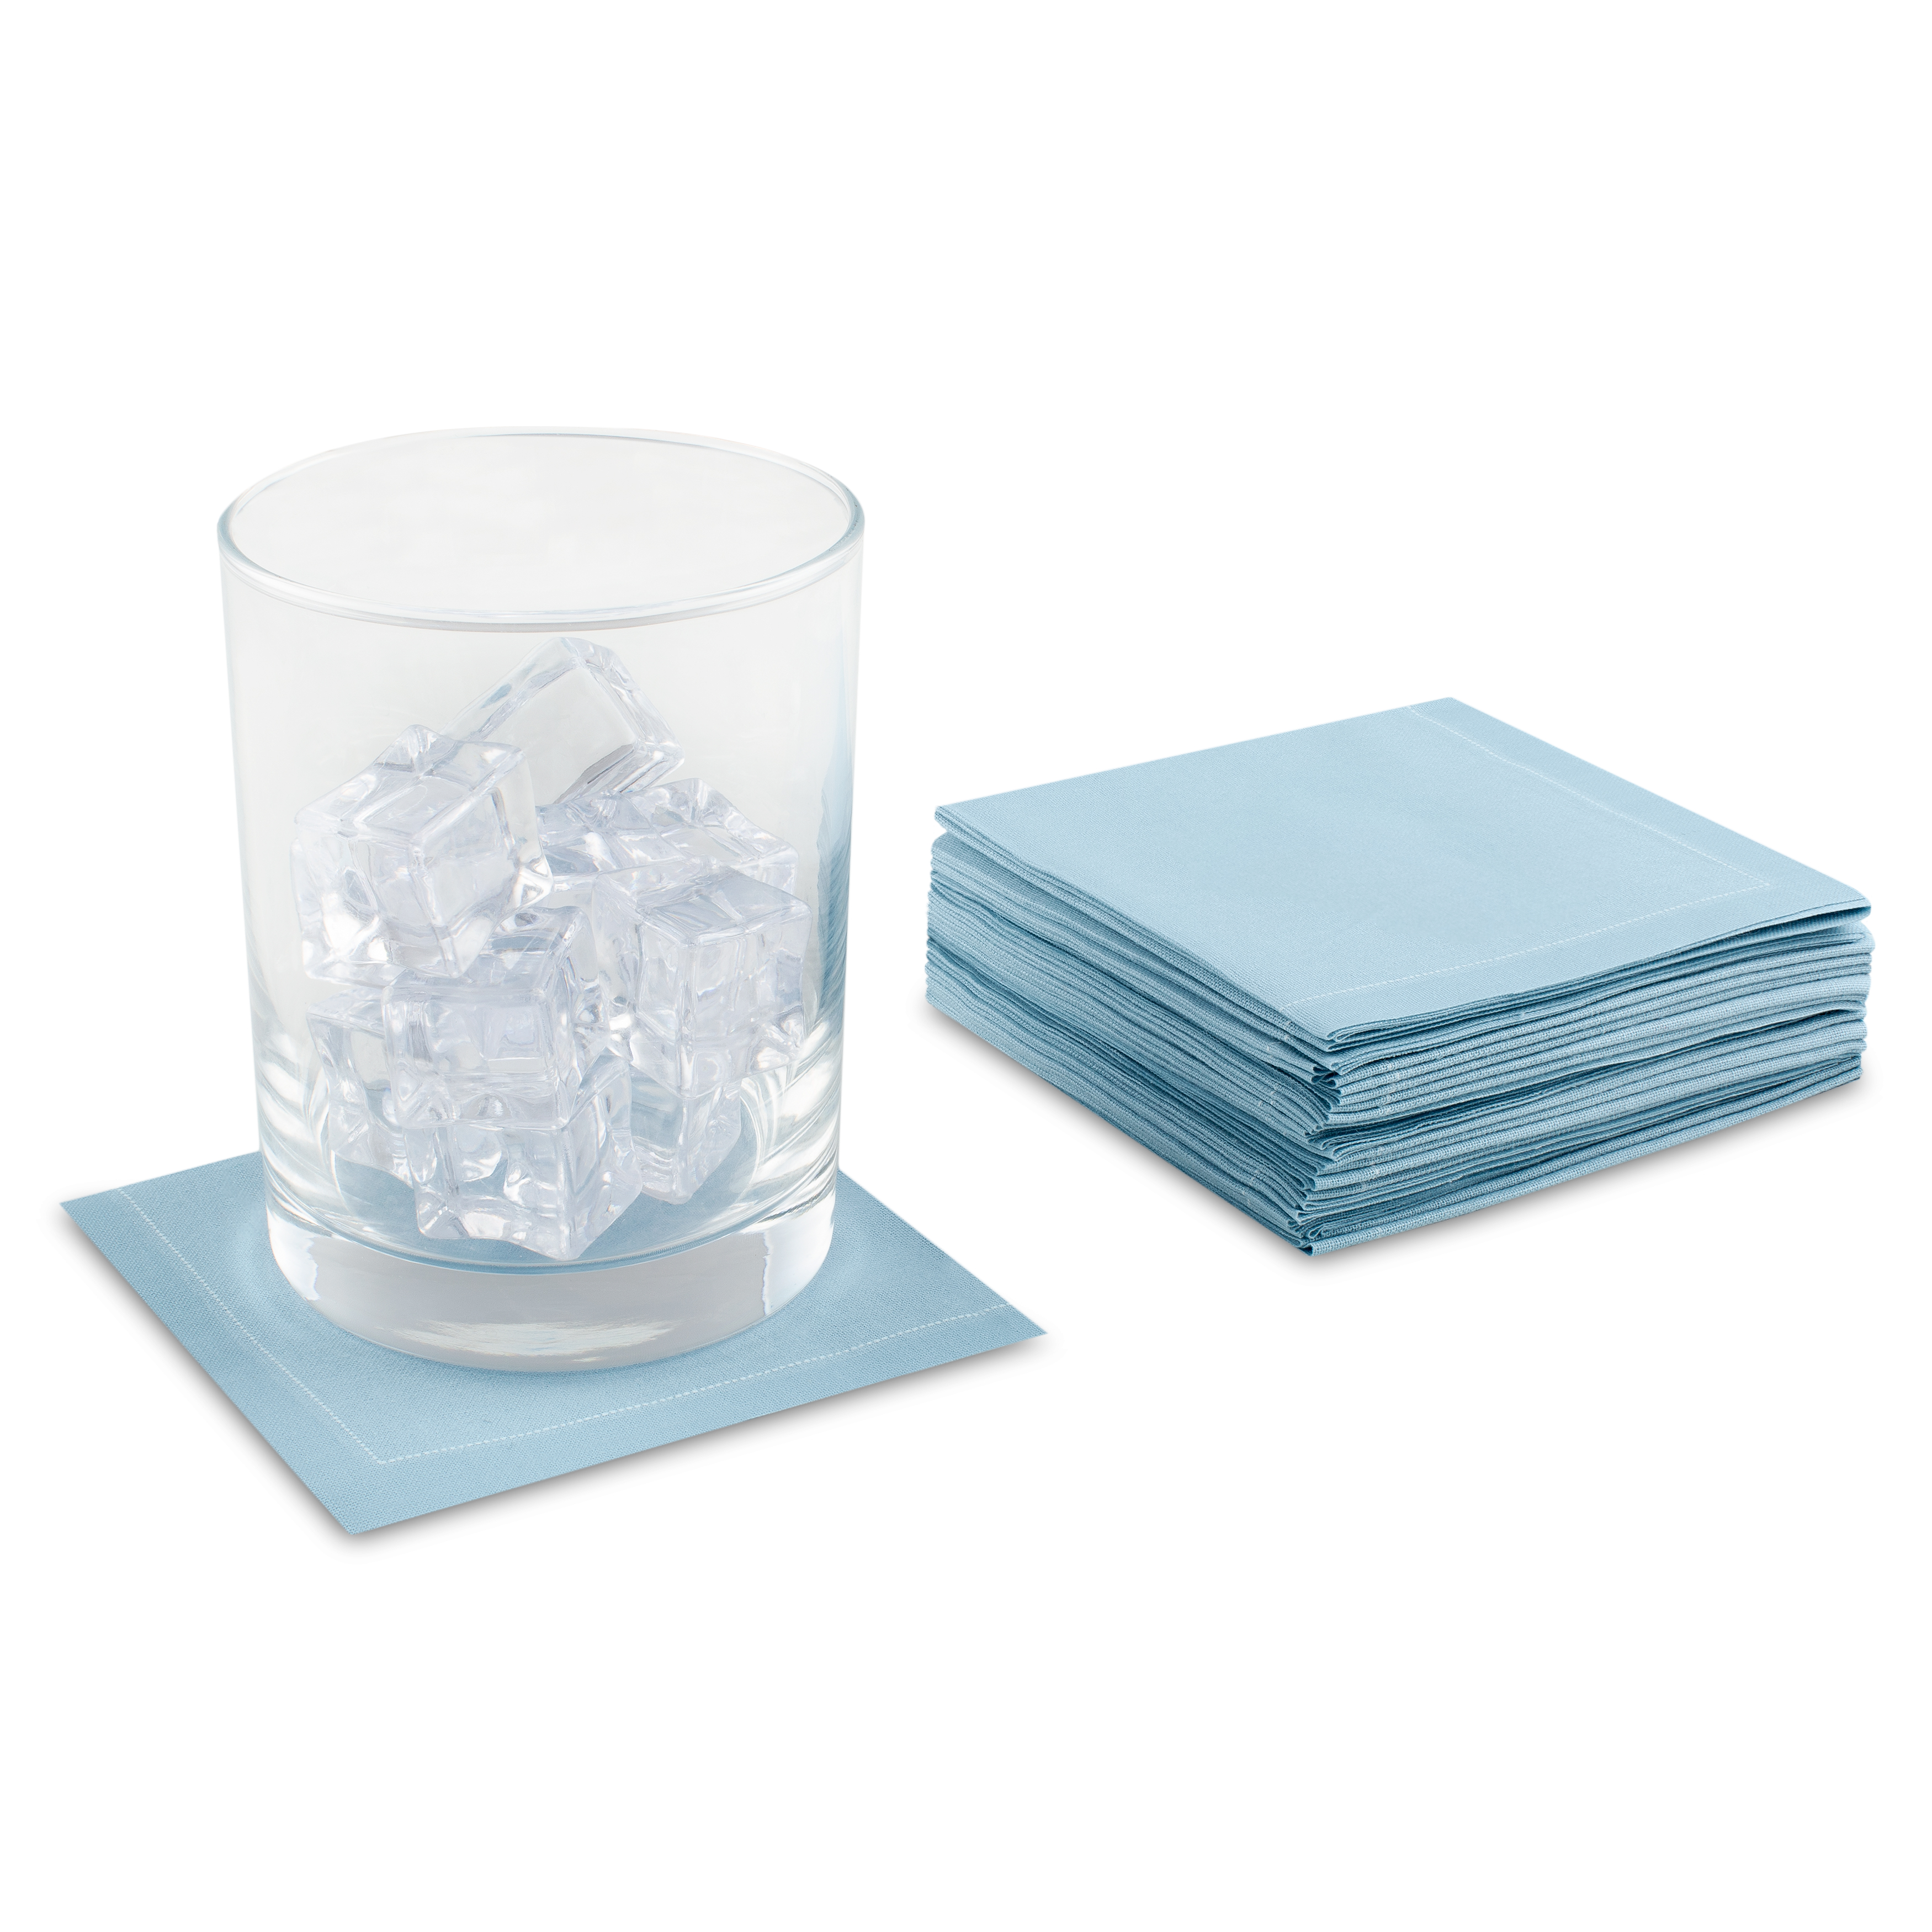 "Sky Blue Cotton 1/4 Fold Cocktail - 8"" x 8"" (folded 4"" x 4"") - 30 units"